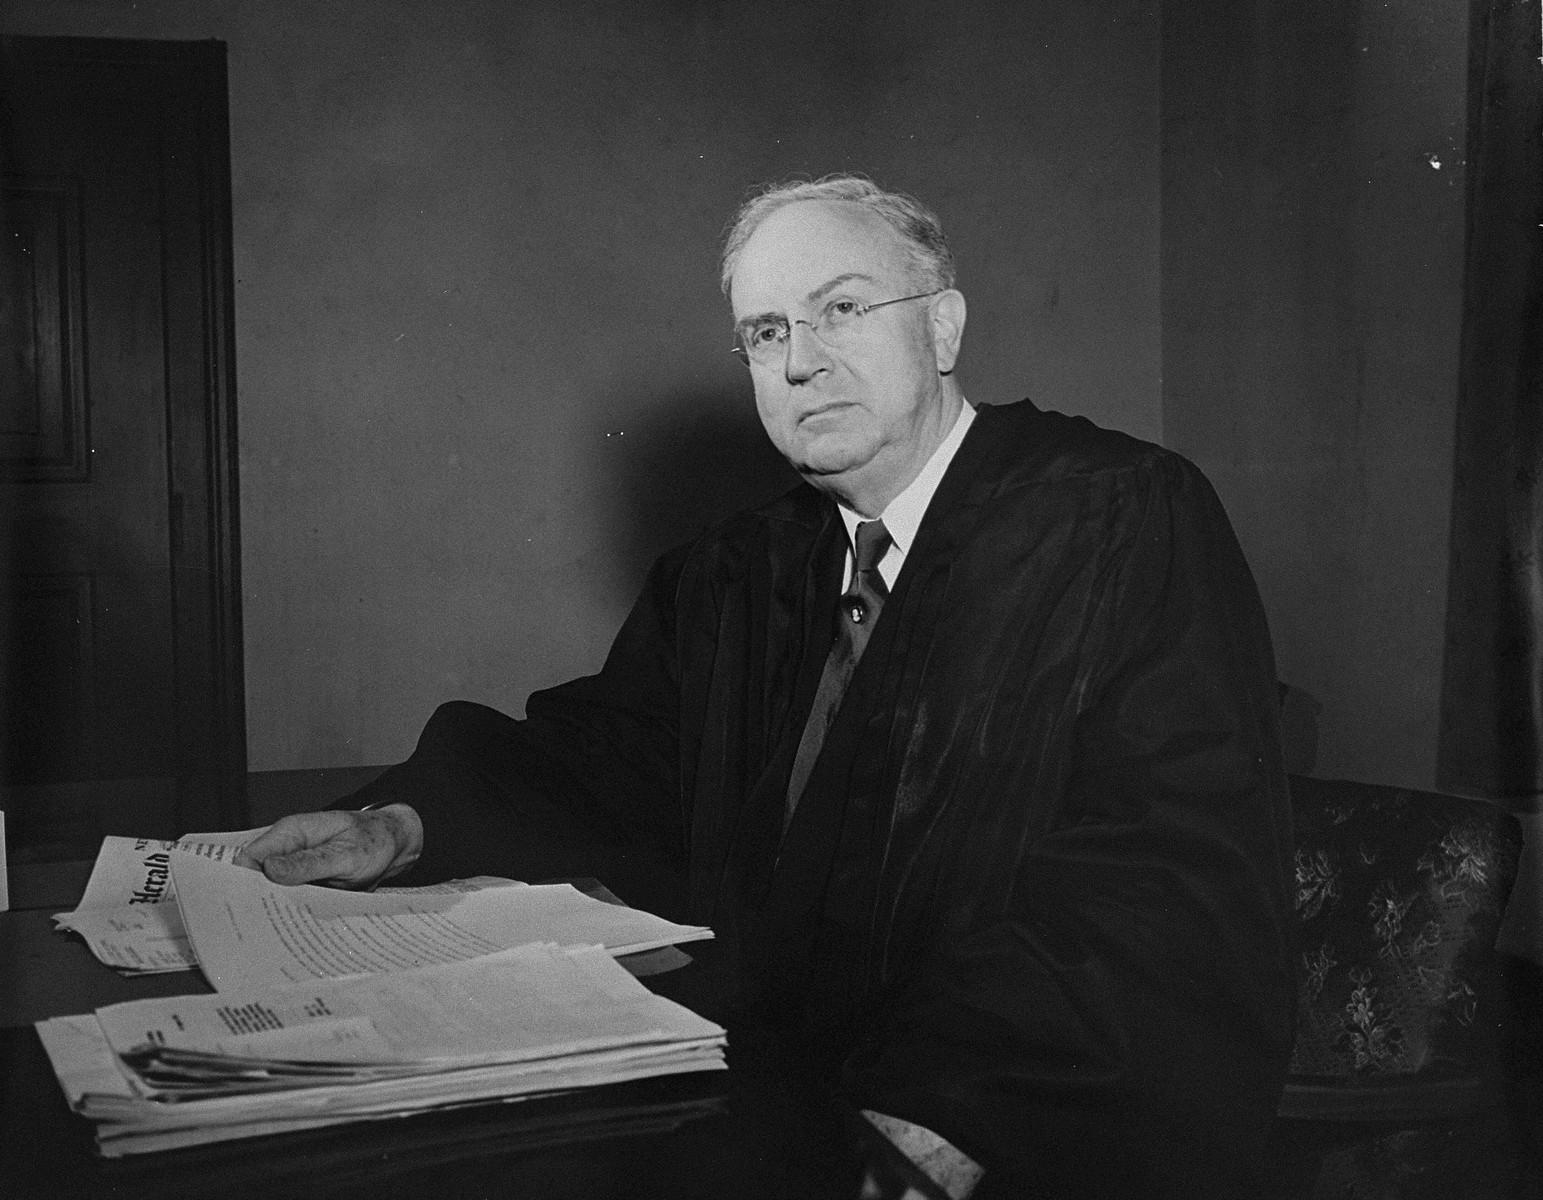 Portrait of Judge John J. Parker, the American alternate member of the International Military Tribunal.